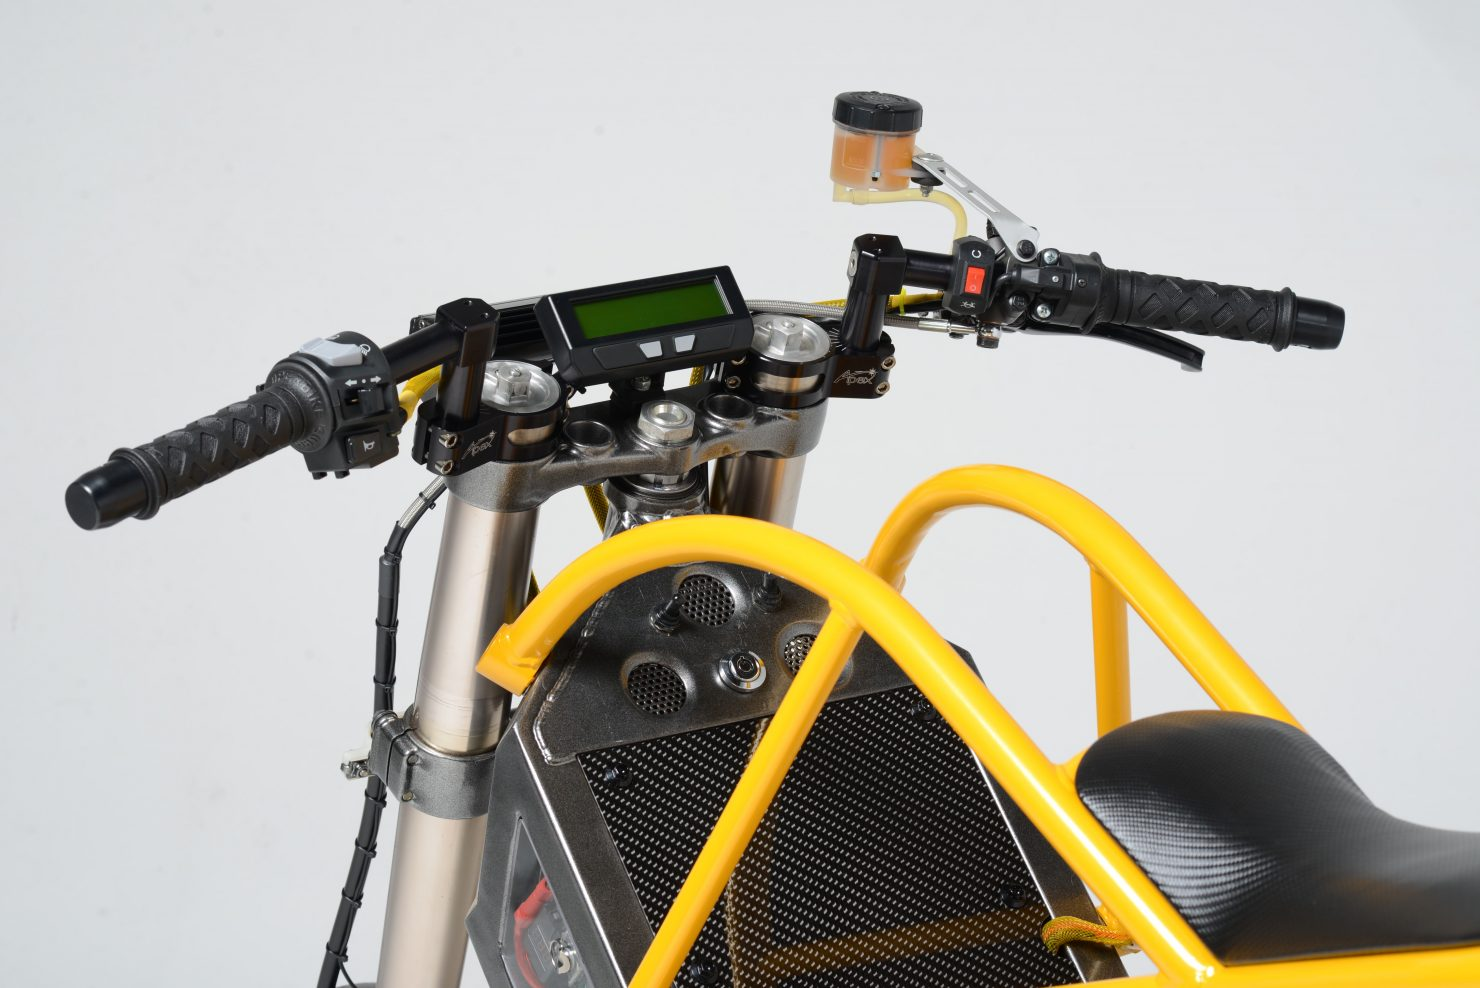 ExoDyne Electric Motorcycle 15 1480x988 - ExoDyne Electric Motorcycle